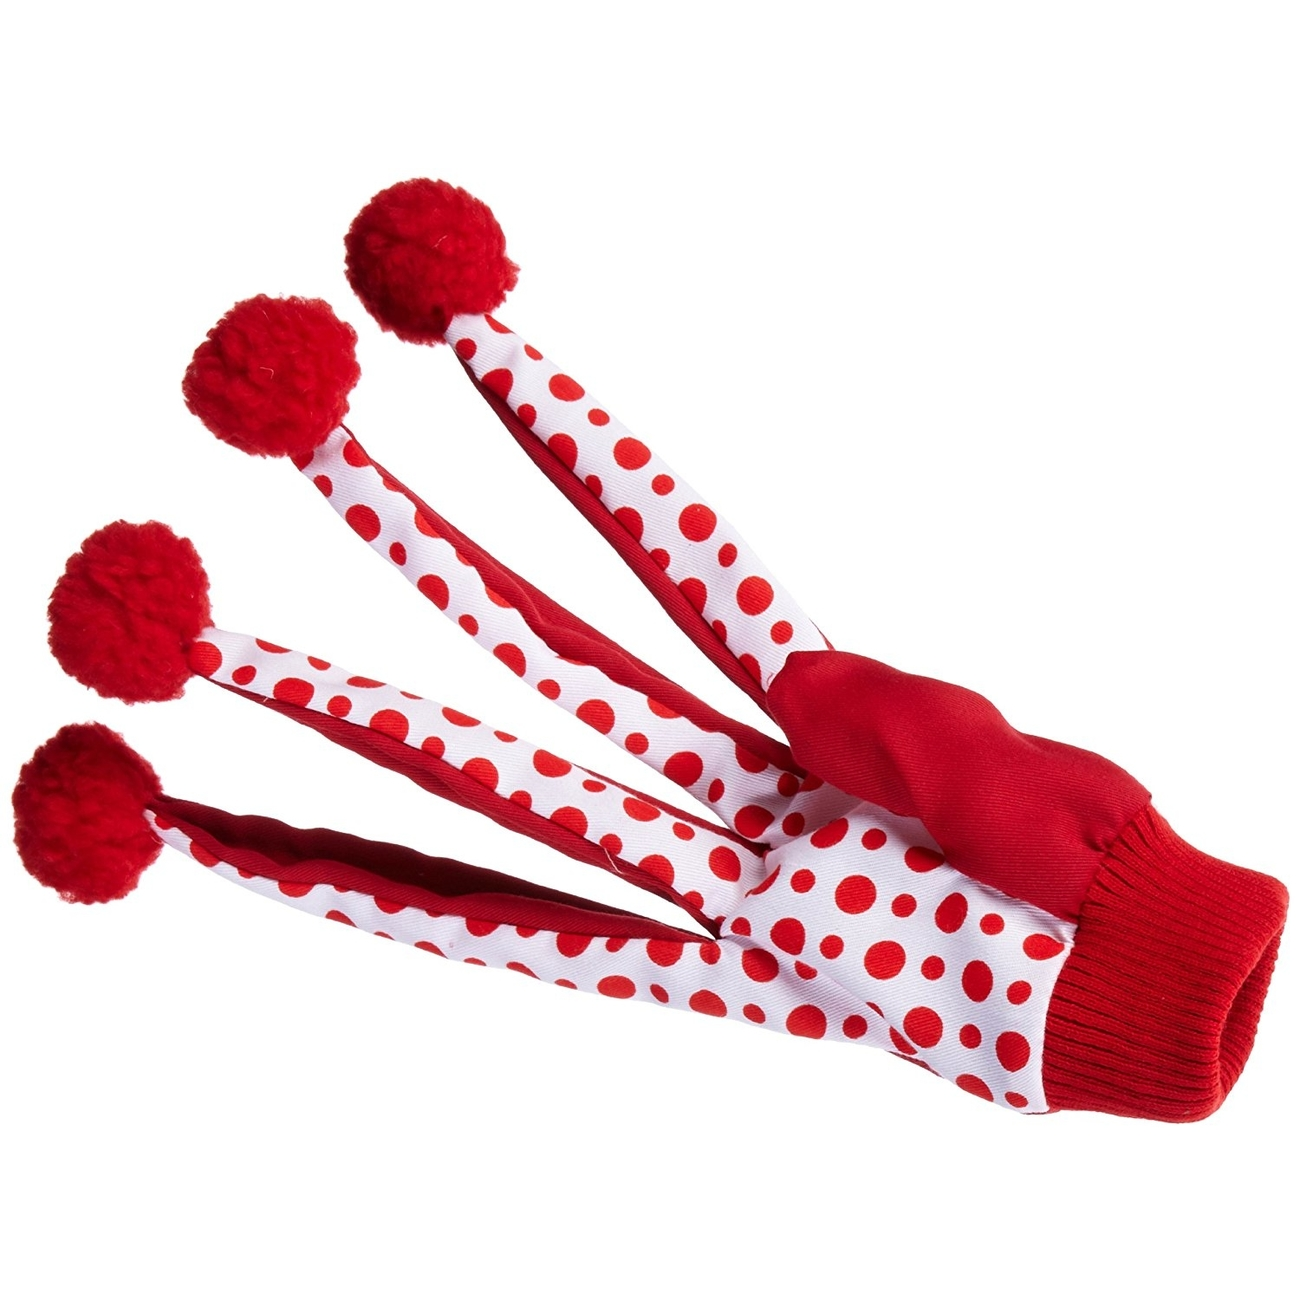 Kerbl Spielhandschuh TILL für Katzen, rot, 15 x 33 cm